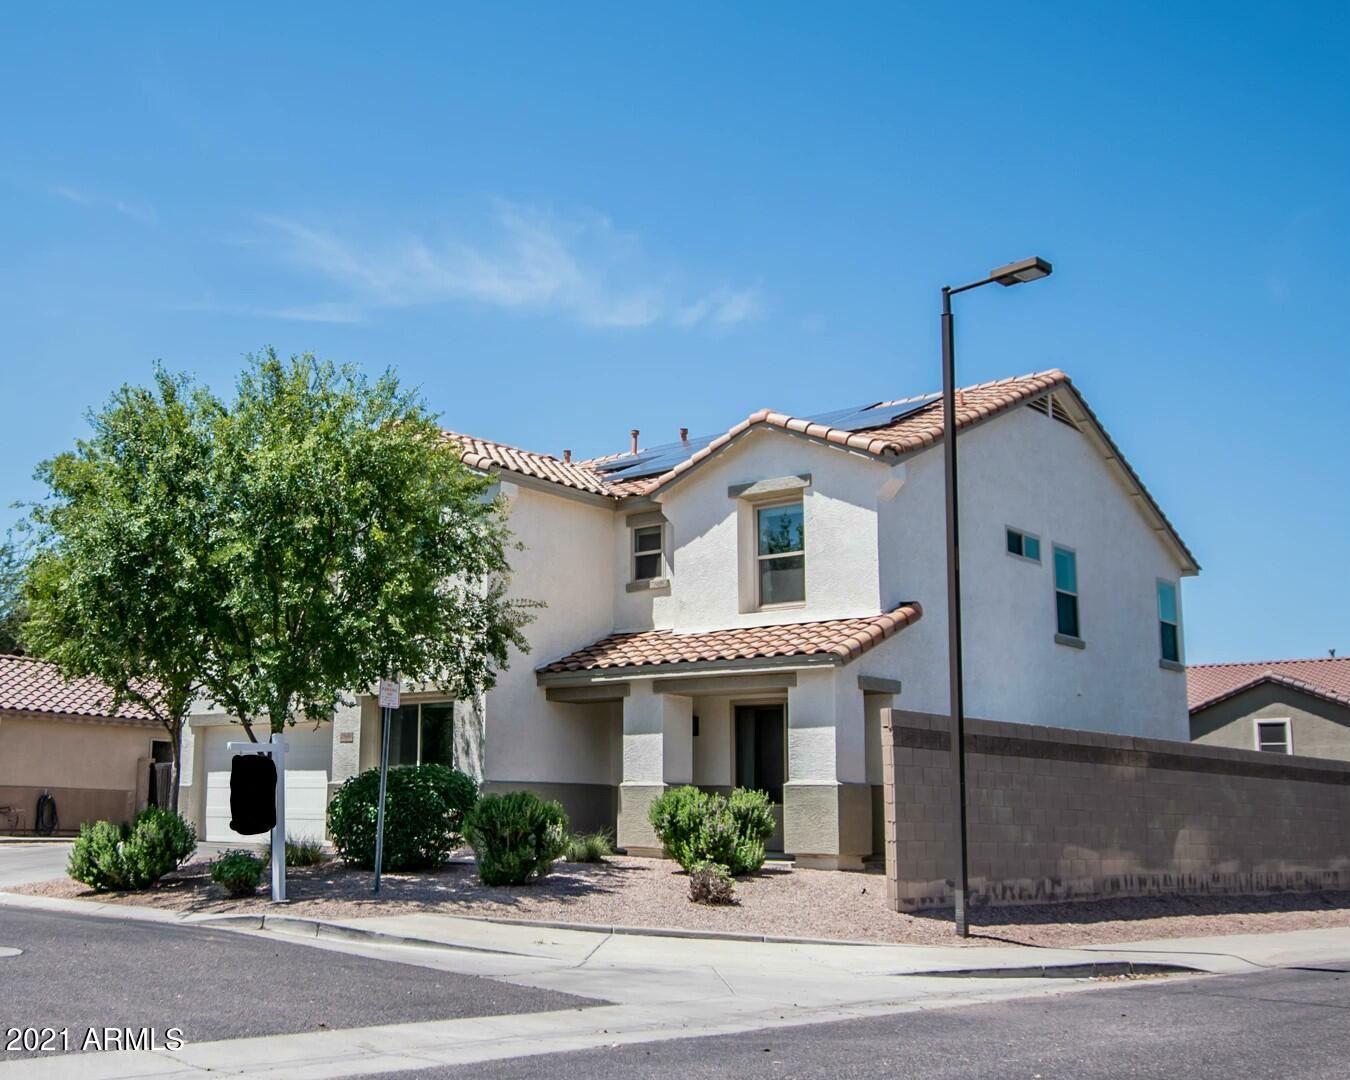 2940 S CAMRY --, Mesa, AZ 85212 - MLS#: 6271396